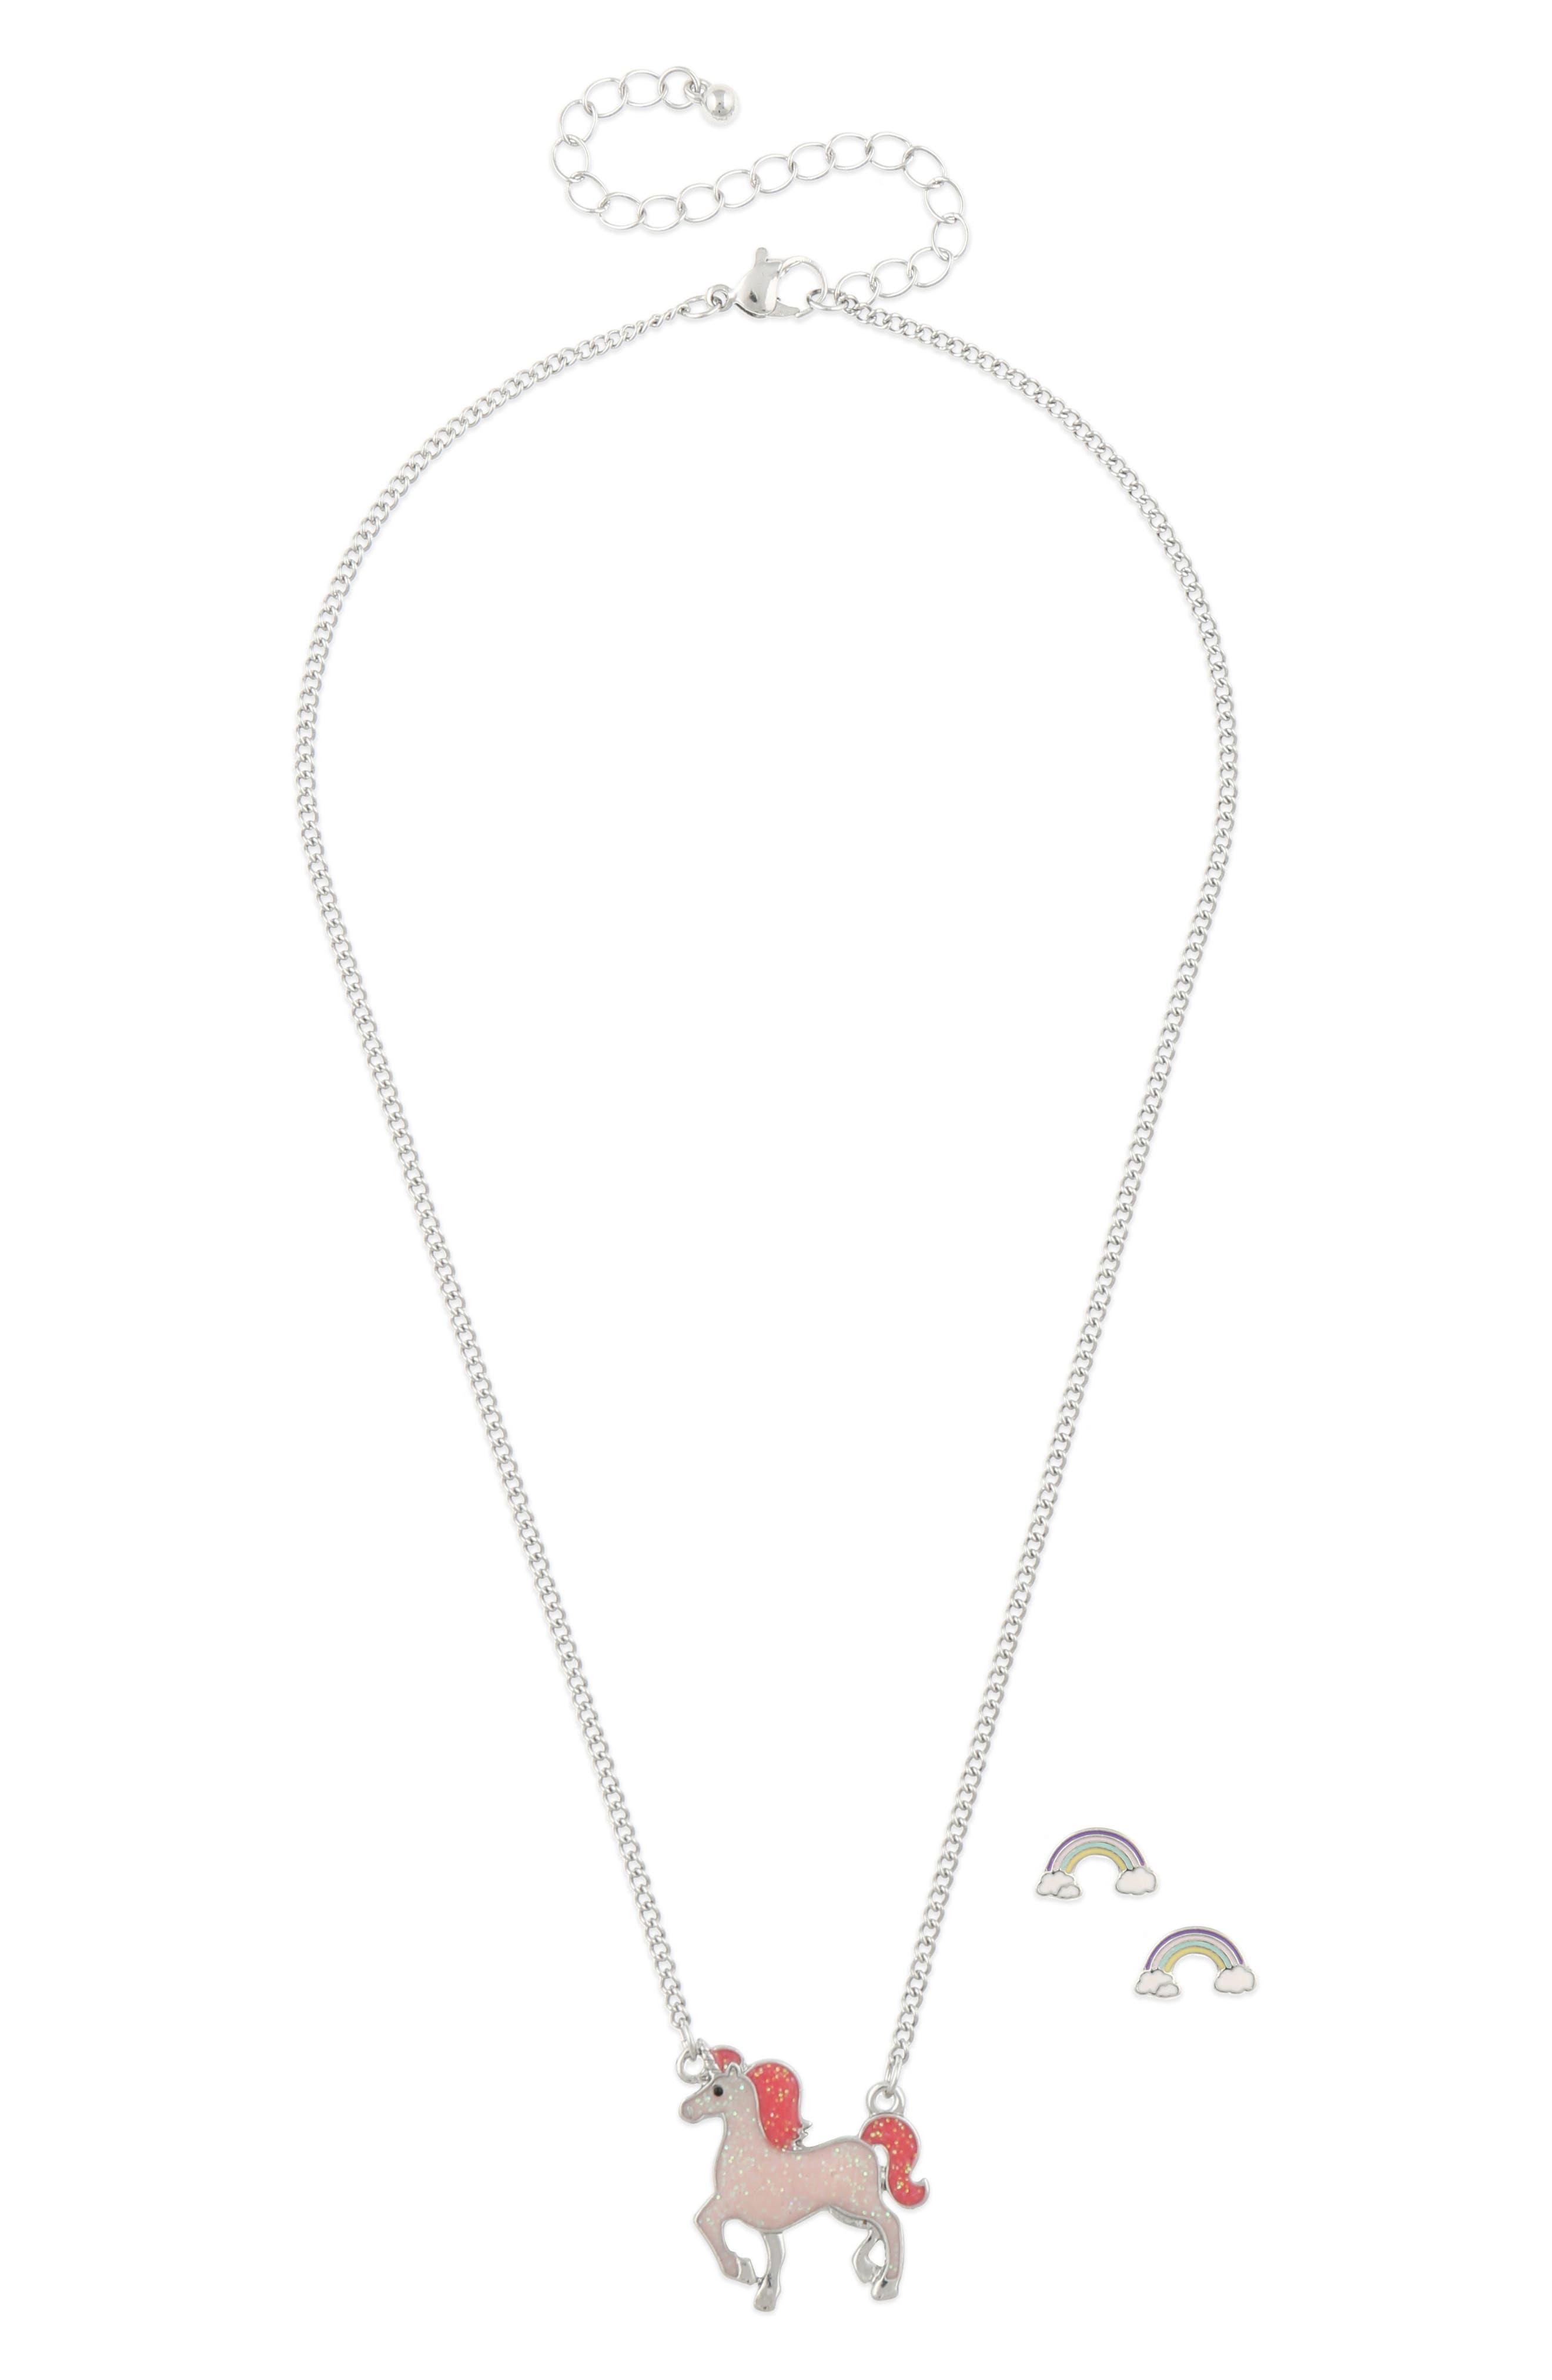 Rainbow Unicorn Necklace & Earrings Set,                             Main thumbnail 1, color,                             PINK COMBO